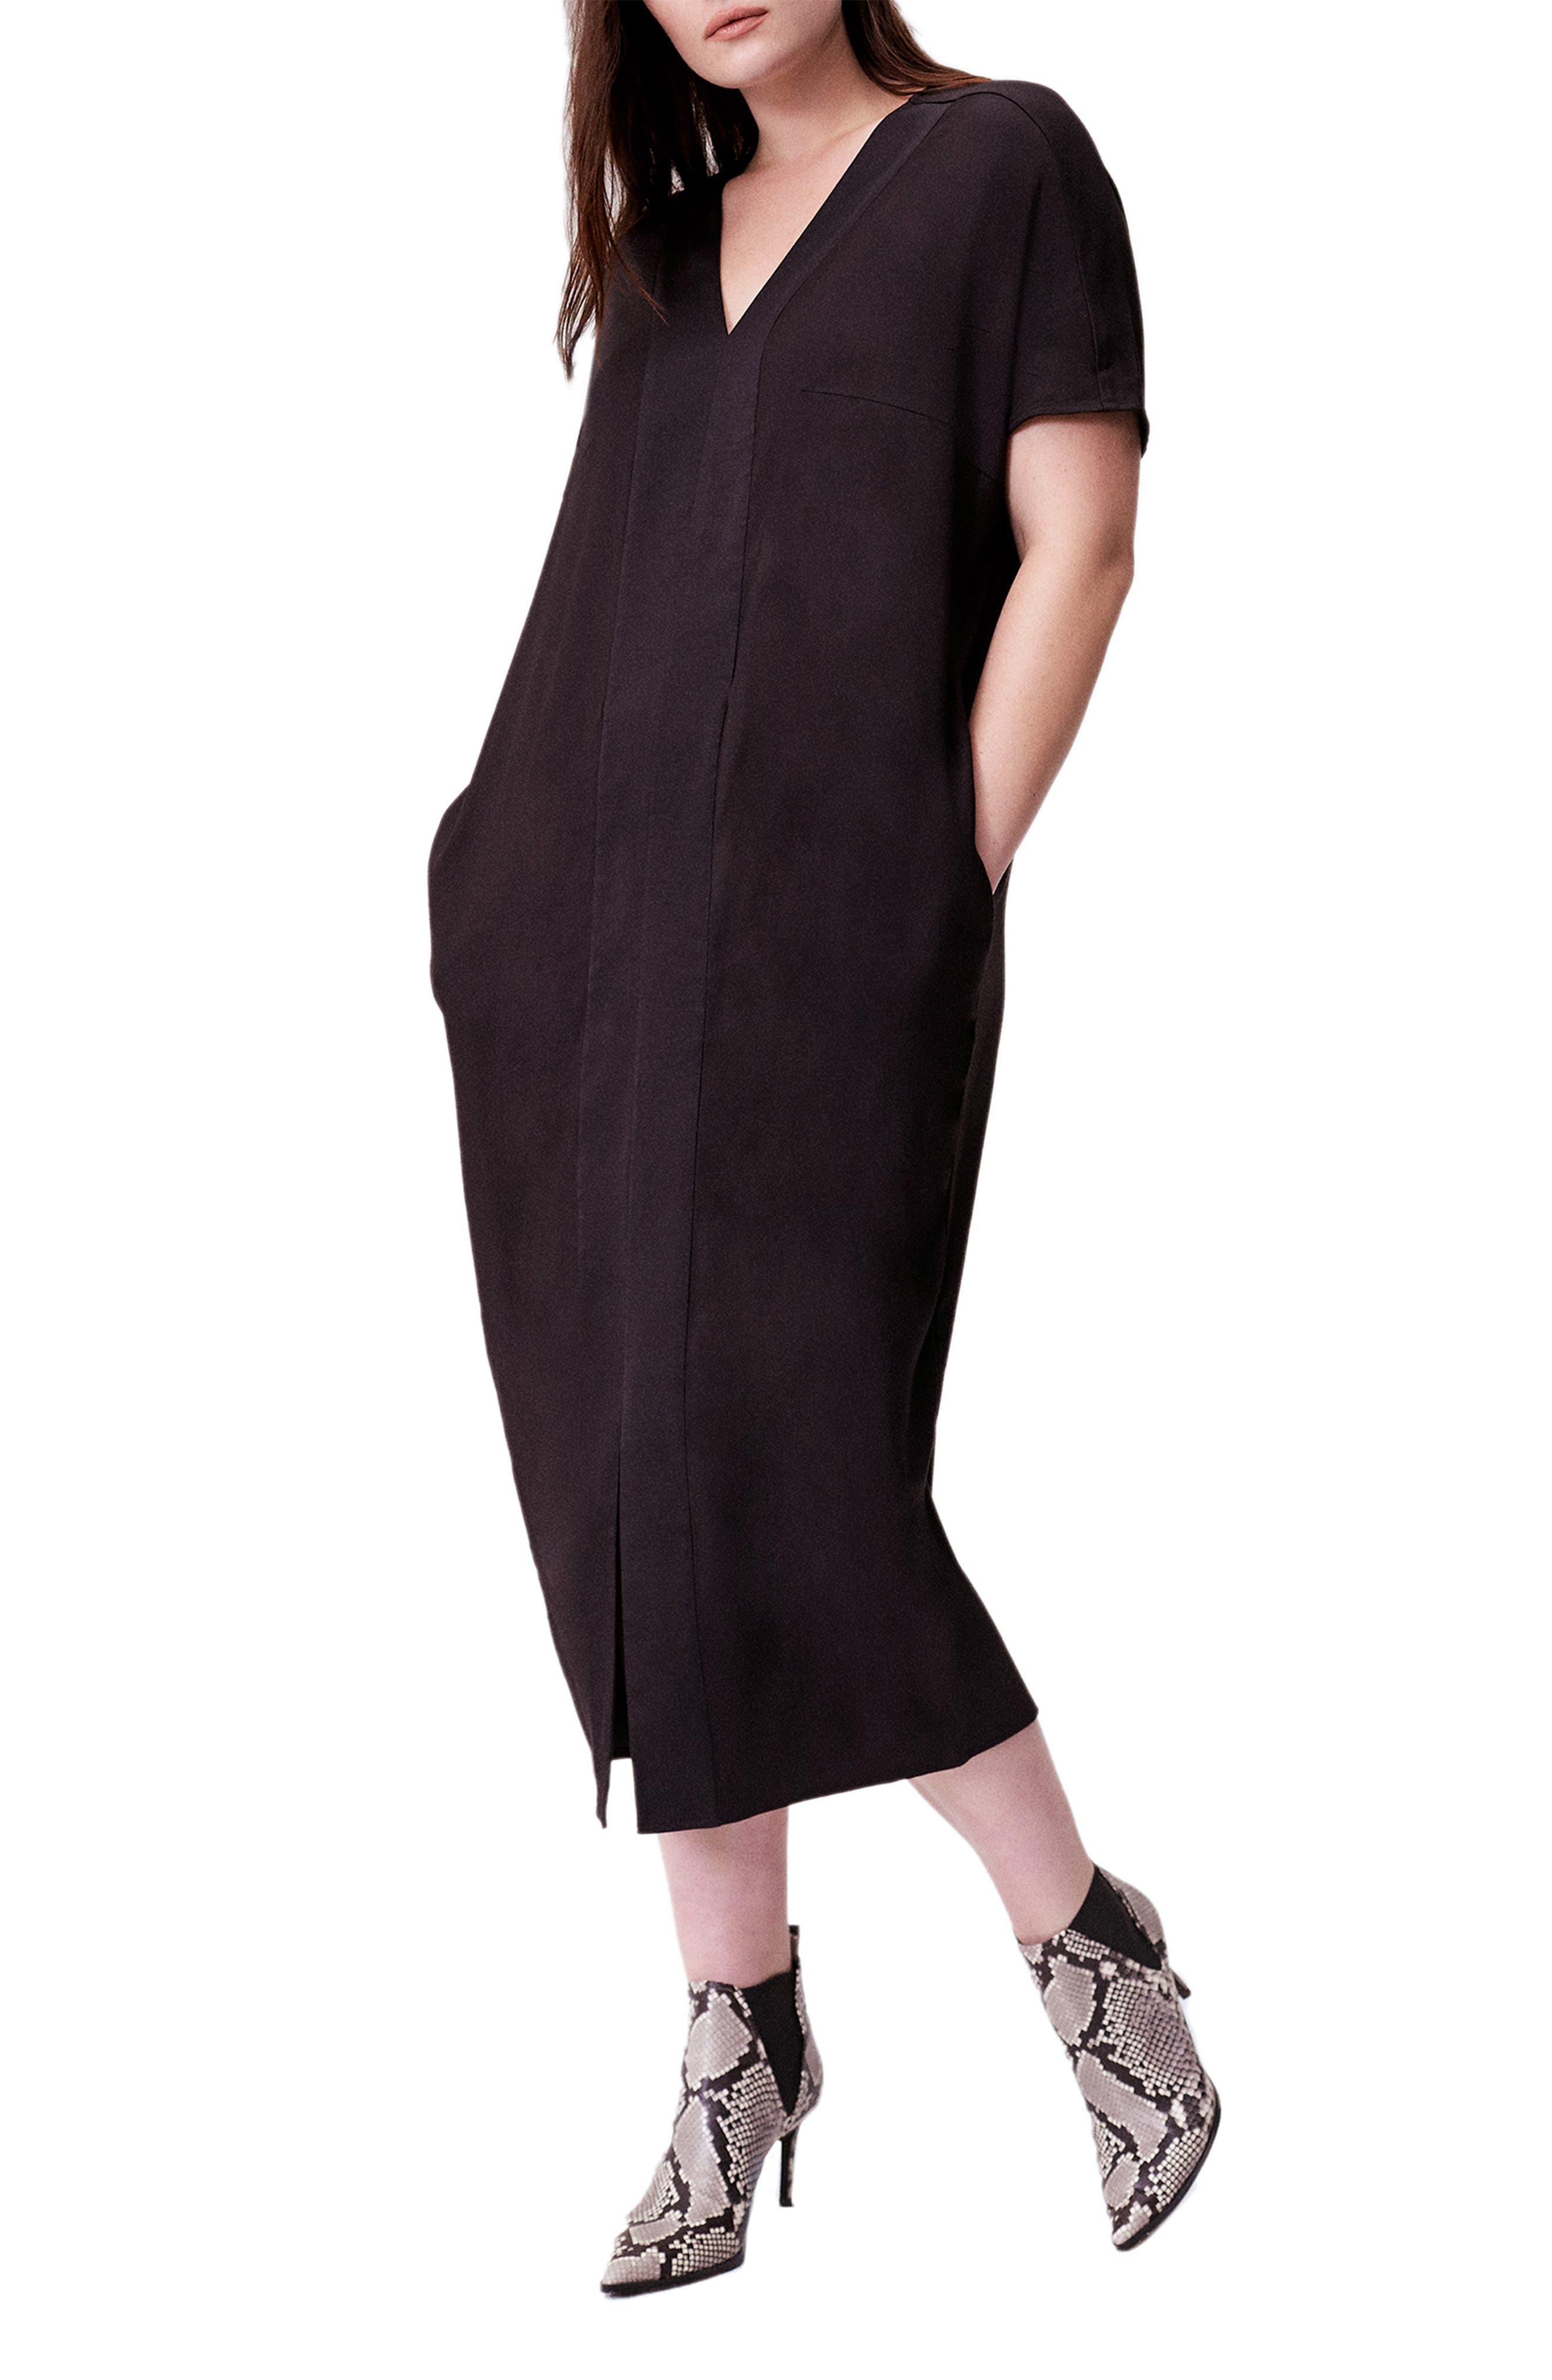 UNIVERSAL STANDARD Crosby Caftan Dress, Main, color, BLACK